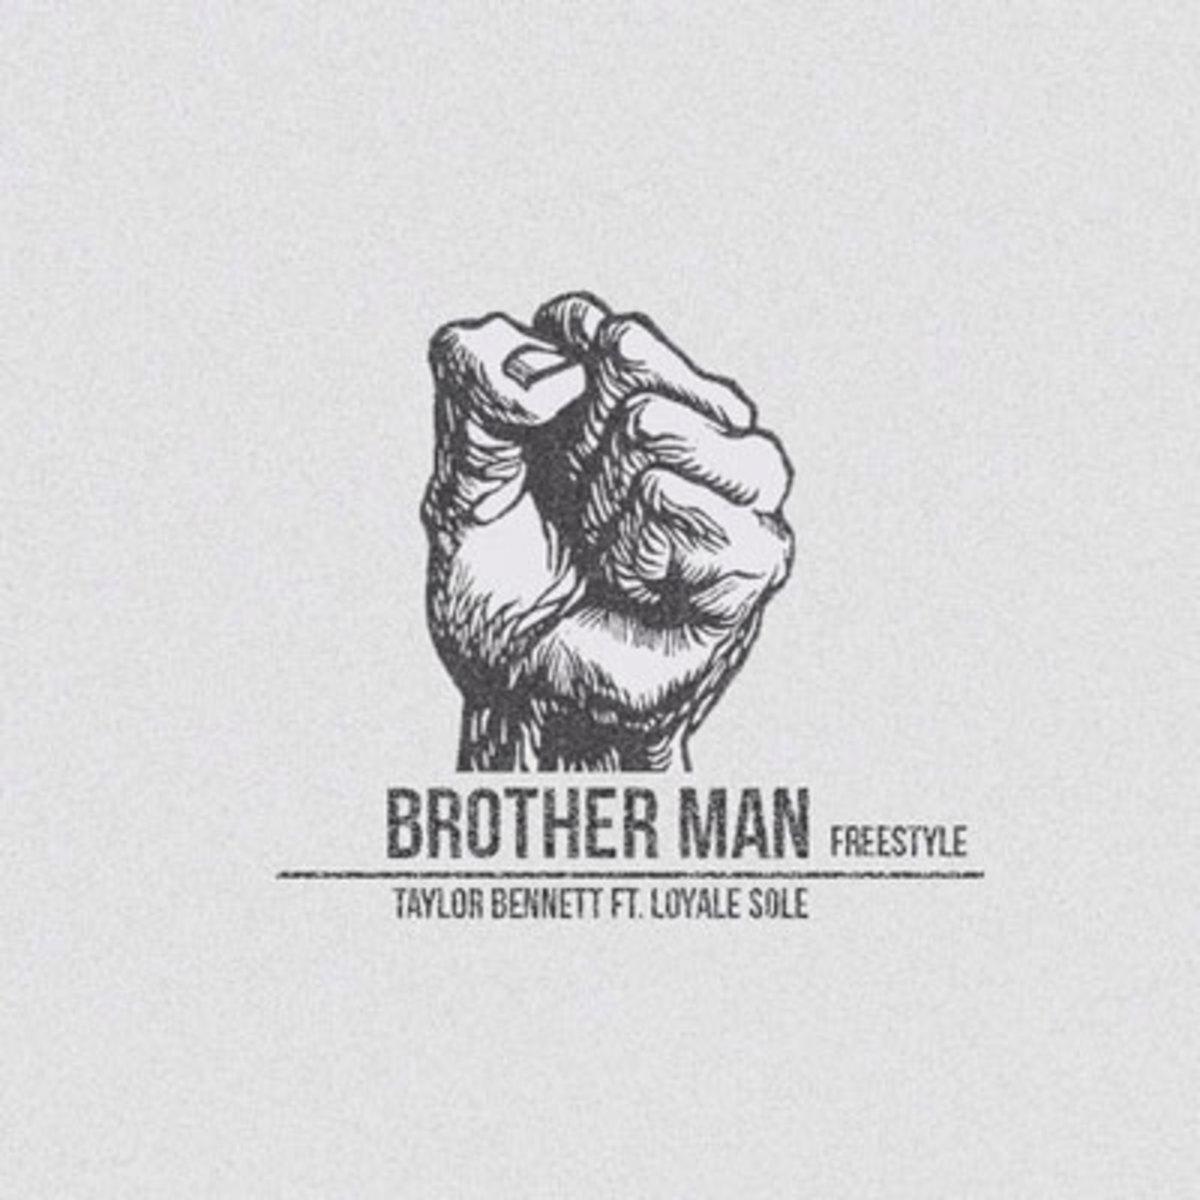 tbennett-brotherman.jpg